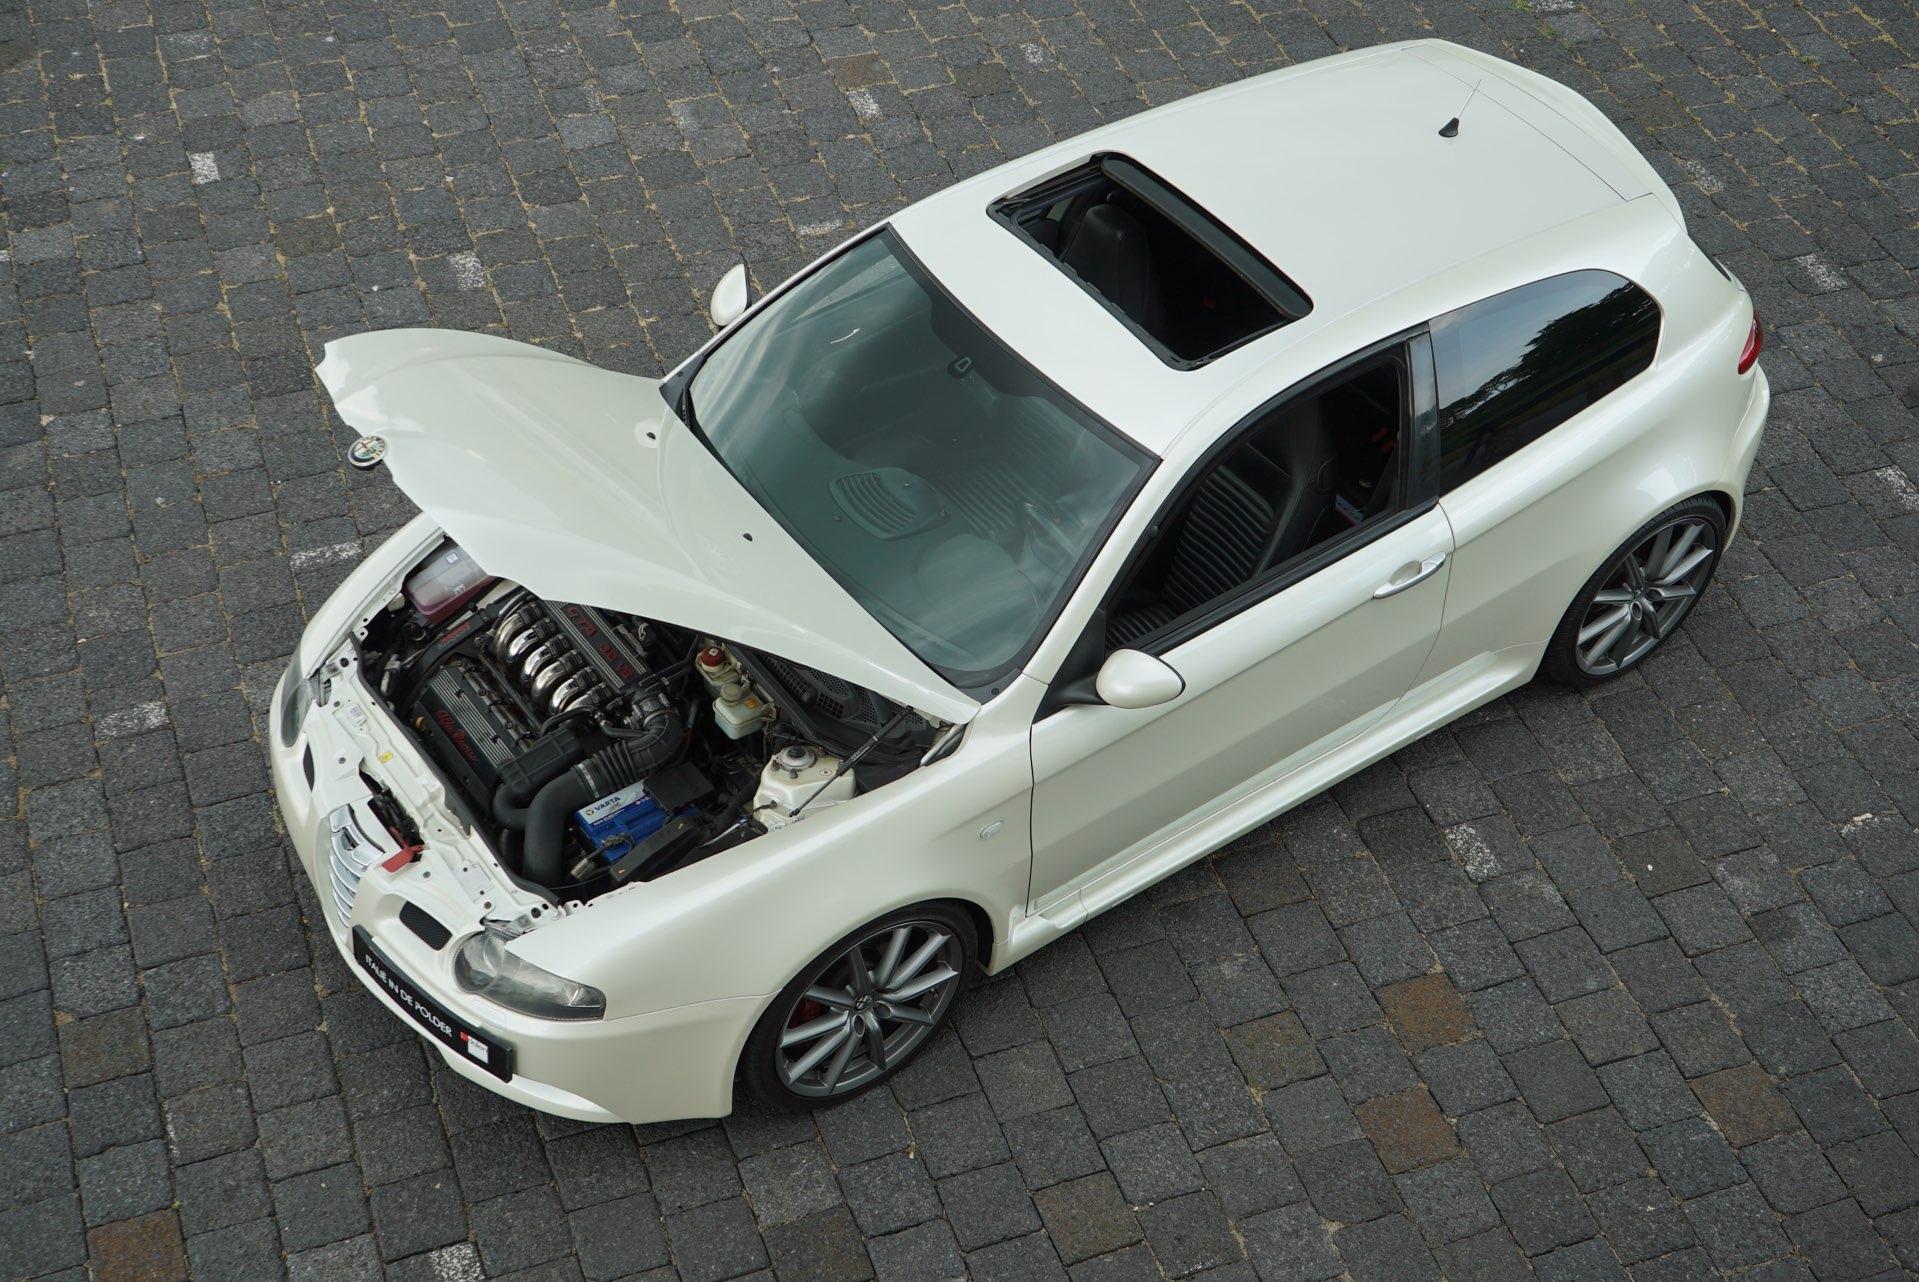 ALFA ROMEO 147 3.2 V6 GTA